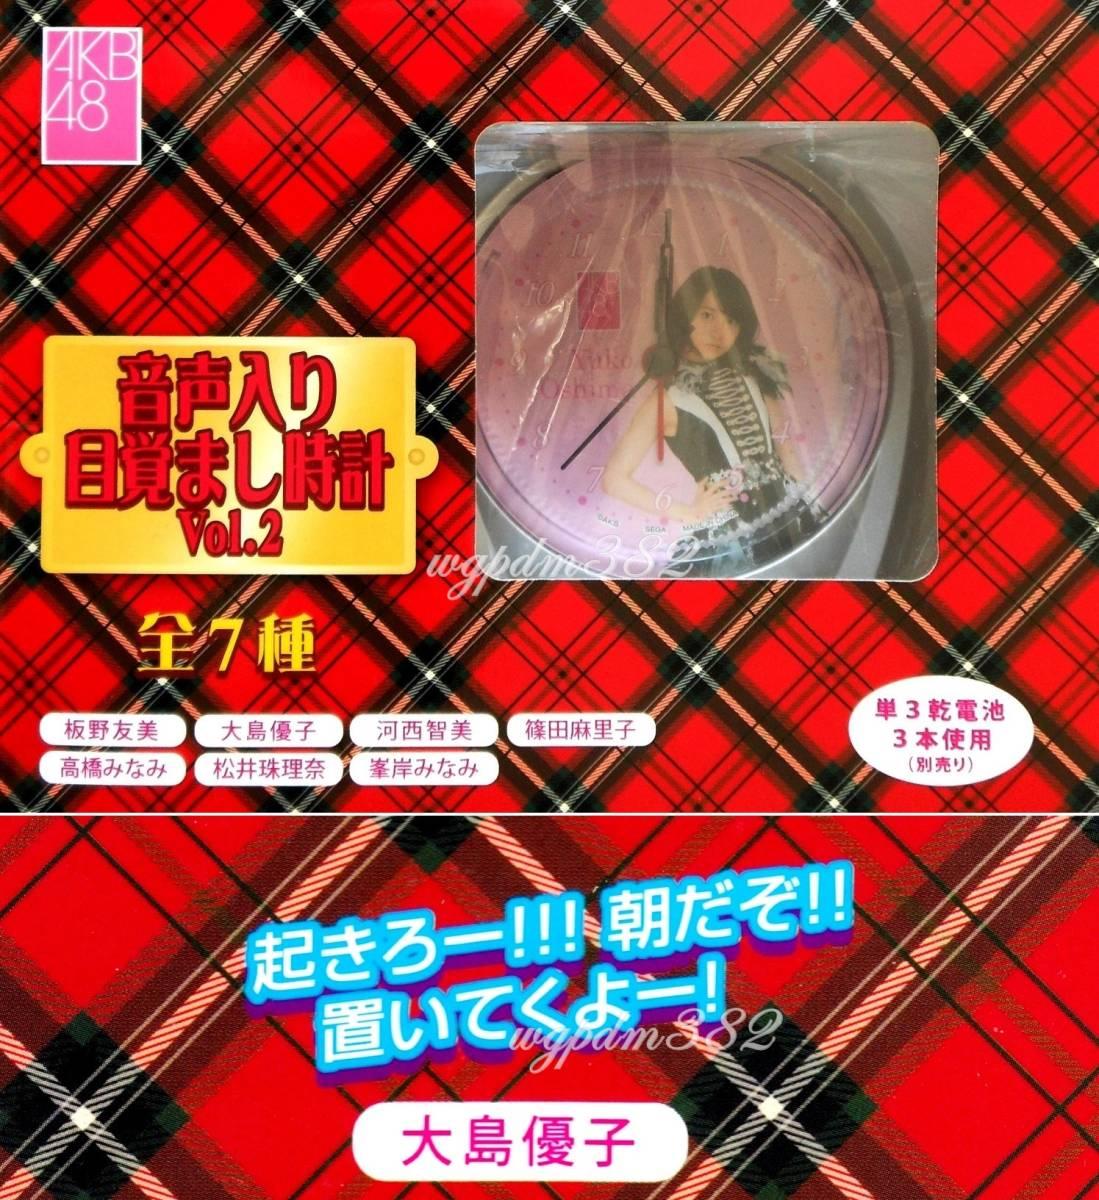 ☆AKB48 大島優子 SEGA 音声入り目覚まし時計 Vol.2 グッズ